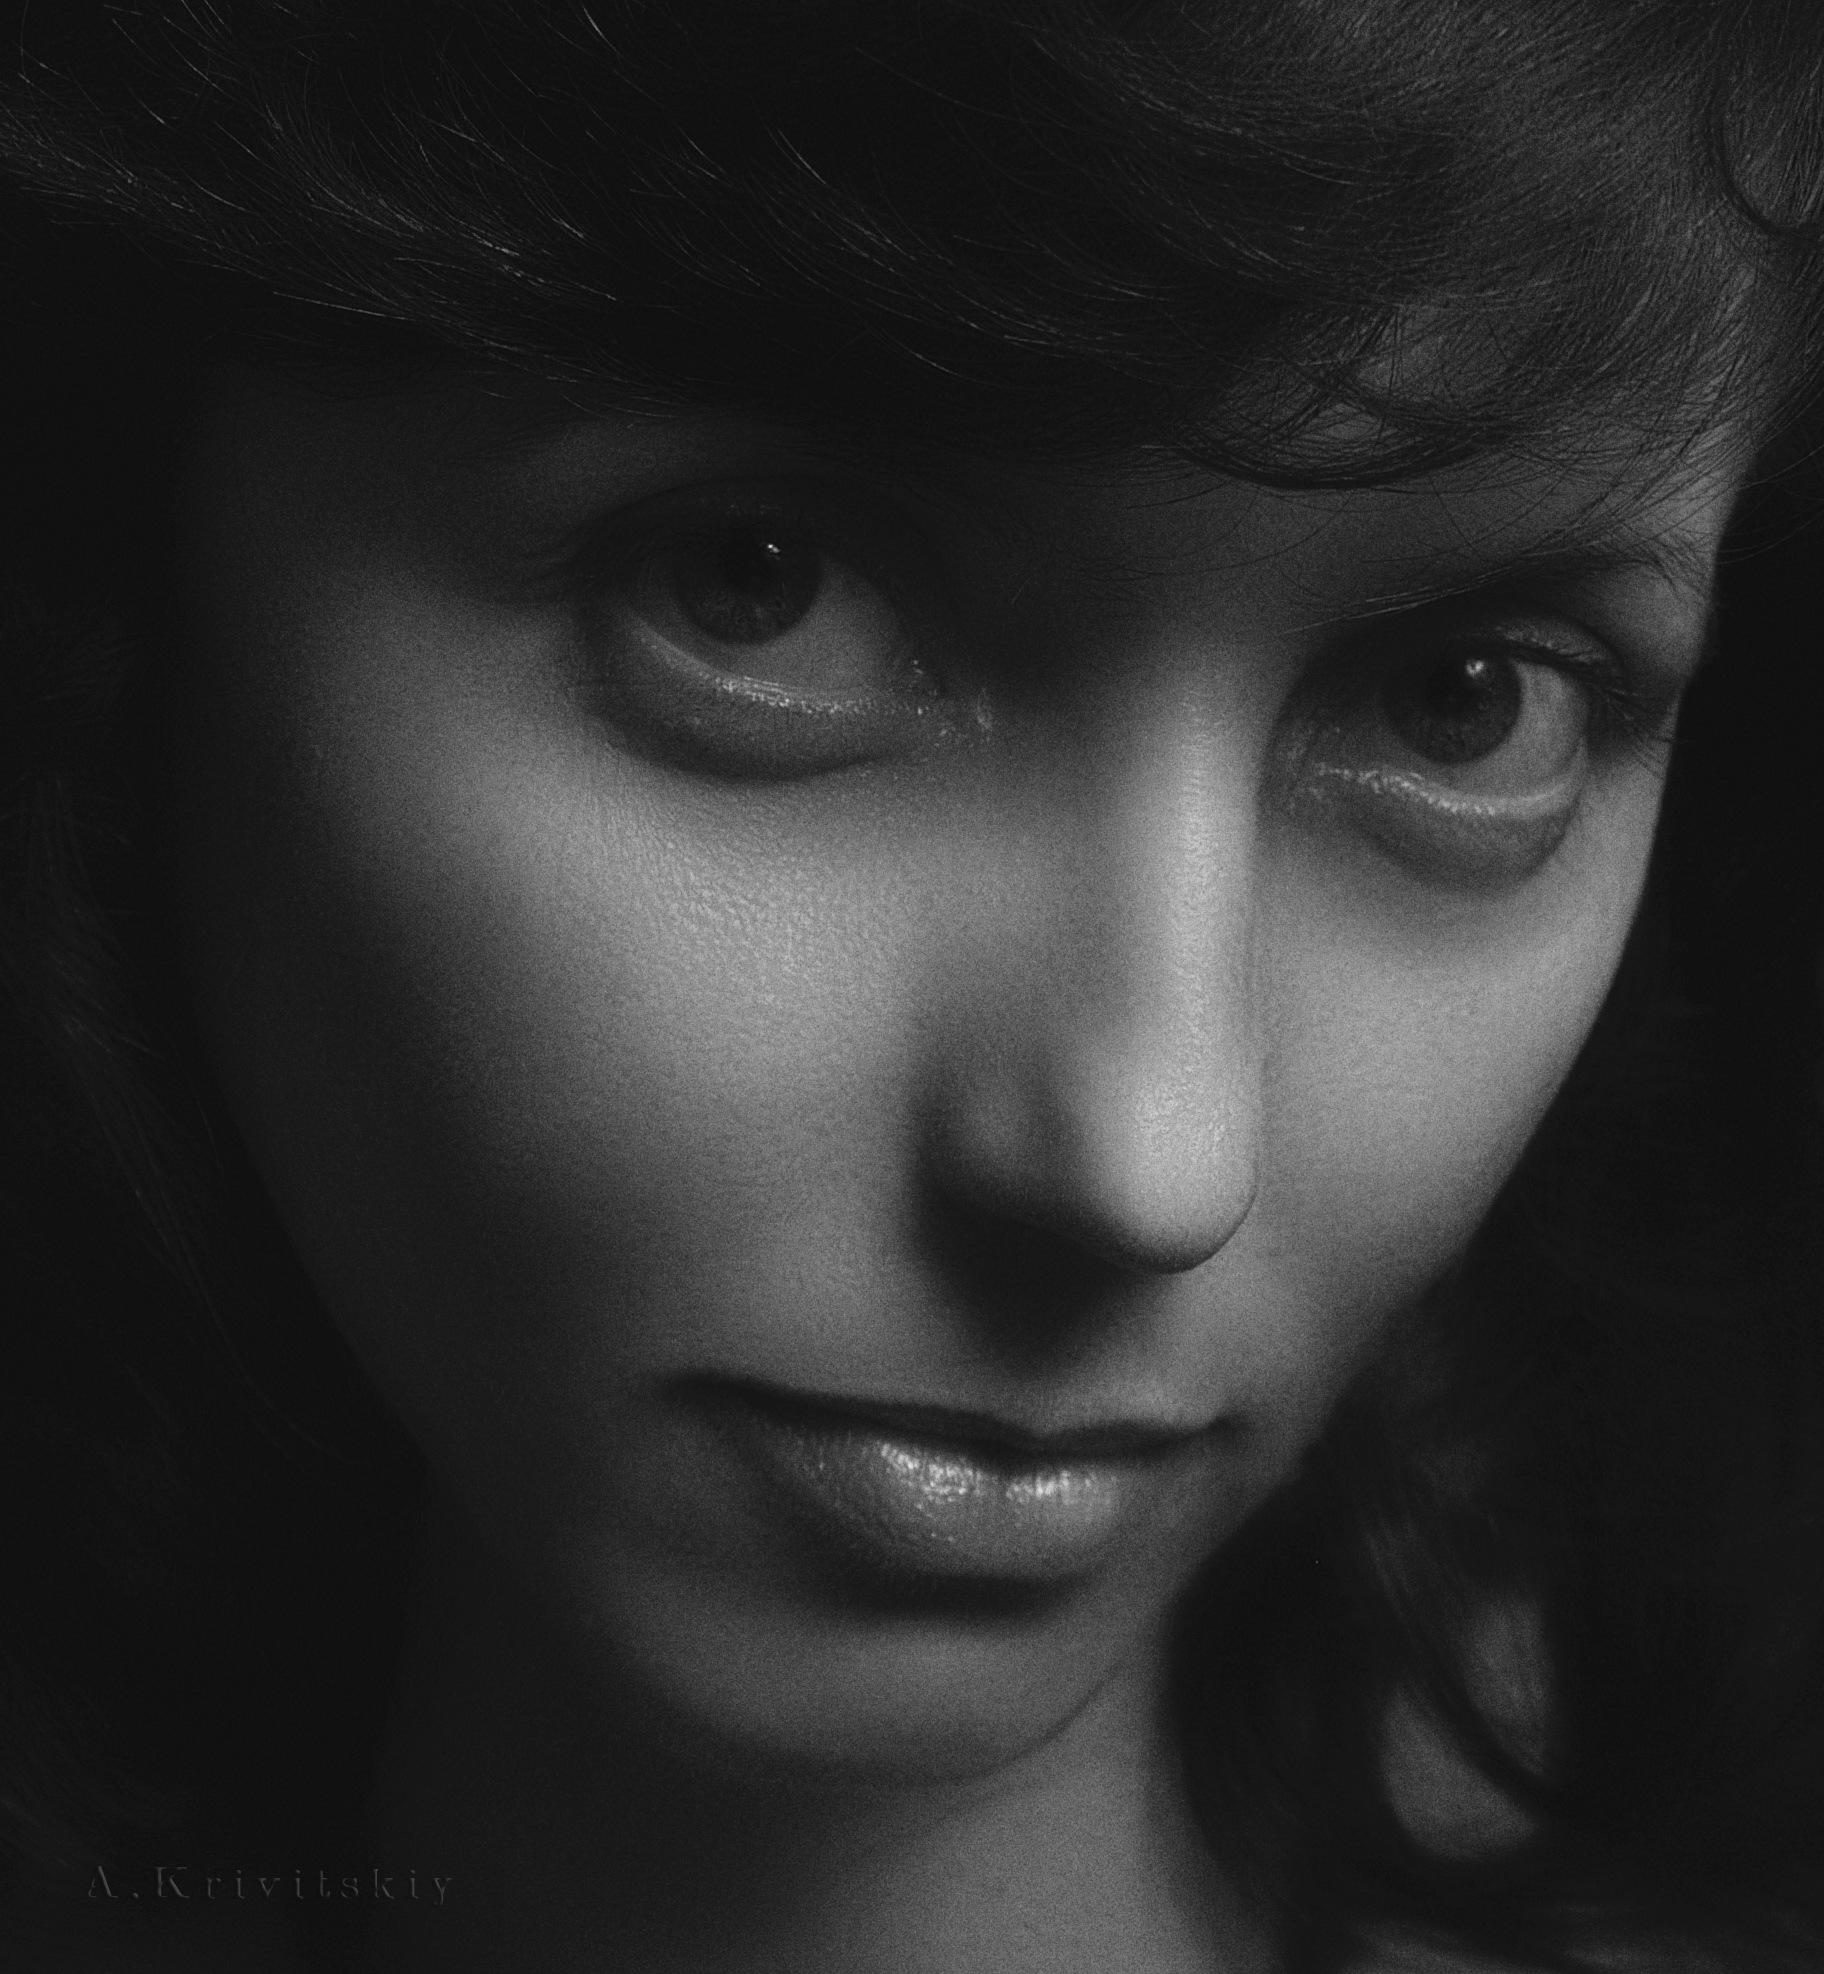 Portrait of a pretty girl in a small studio . Портрет симпатичной девушки в маленькой студии. by krivitskiy